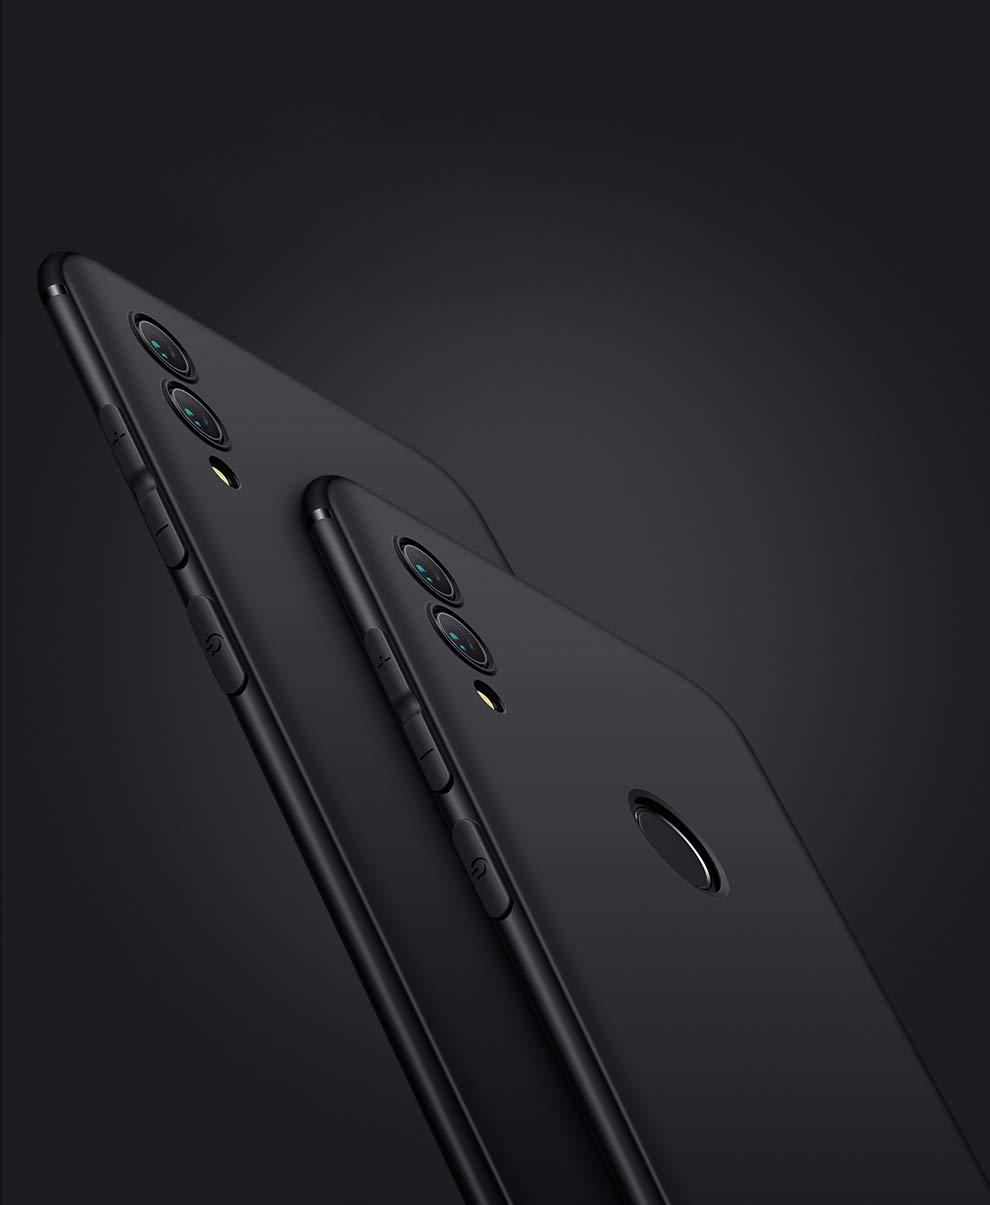 Olliwon Funda Huawei Honor 8X, Ultra Slim Silicona TPU Carcasa Anti-Arañazos y Antideslizante 360 Cover Case para Huawei Honor 8X Nergo: Amazon.es: ...